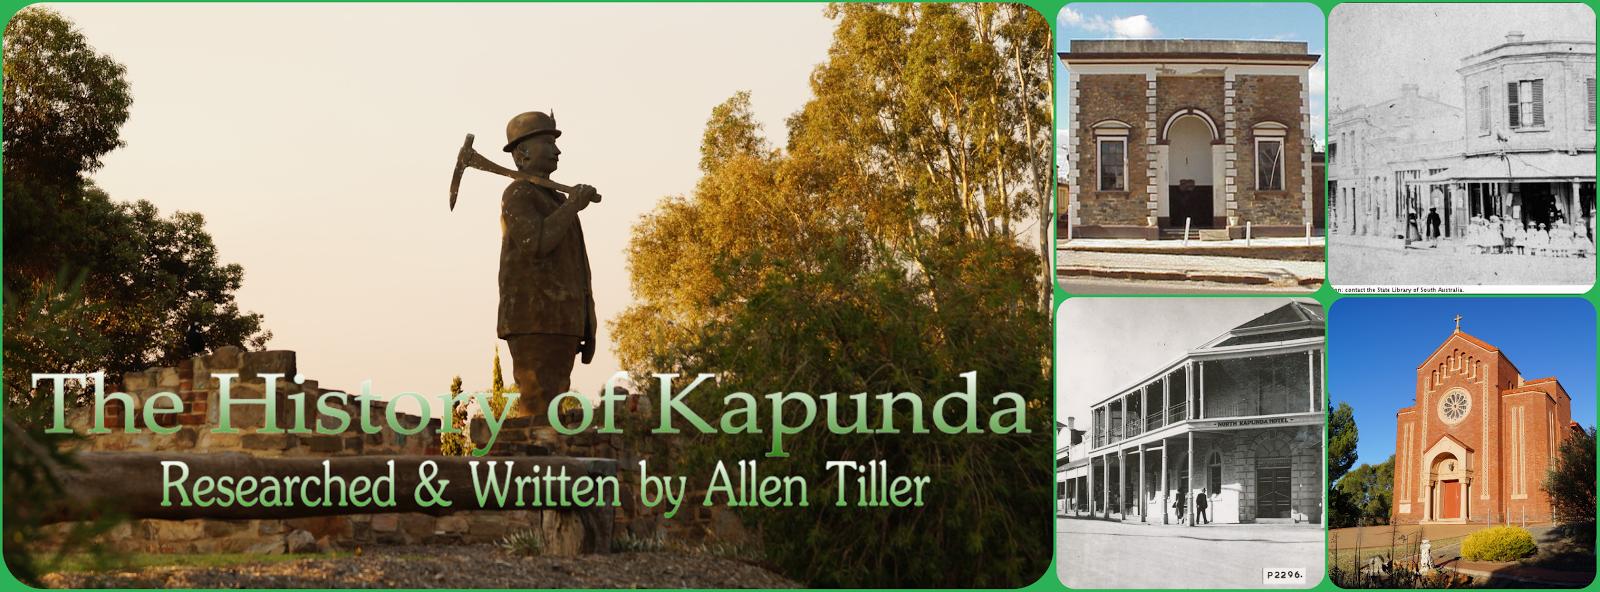 The History of Kapunda